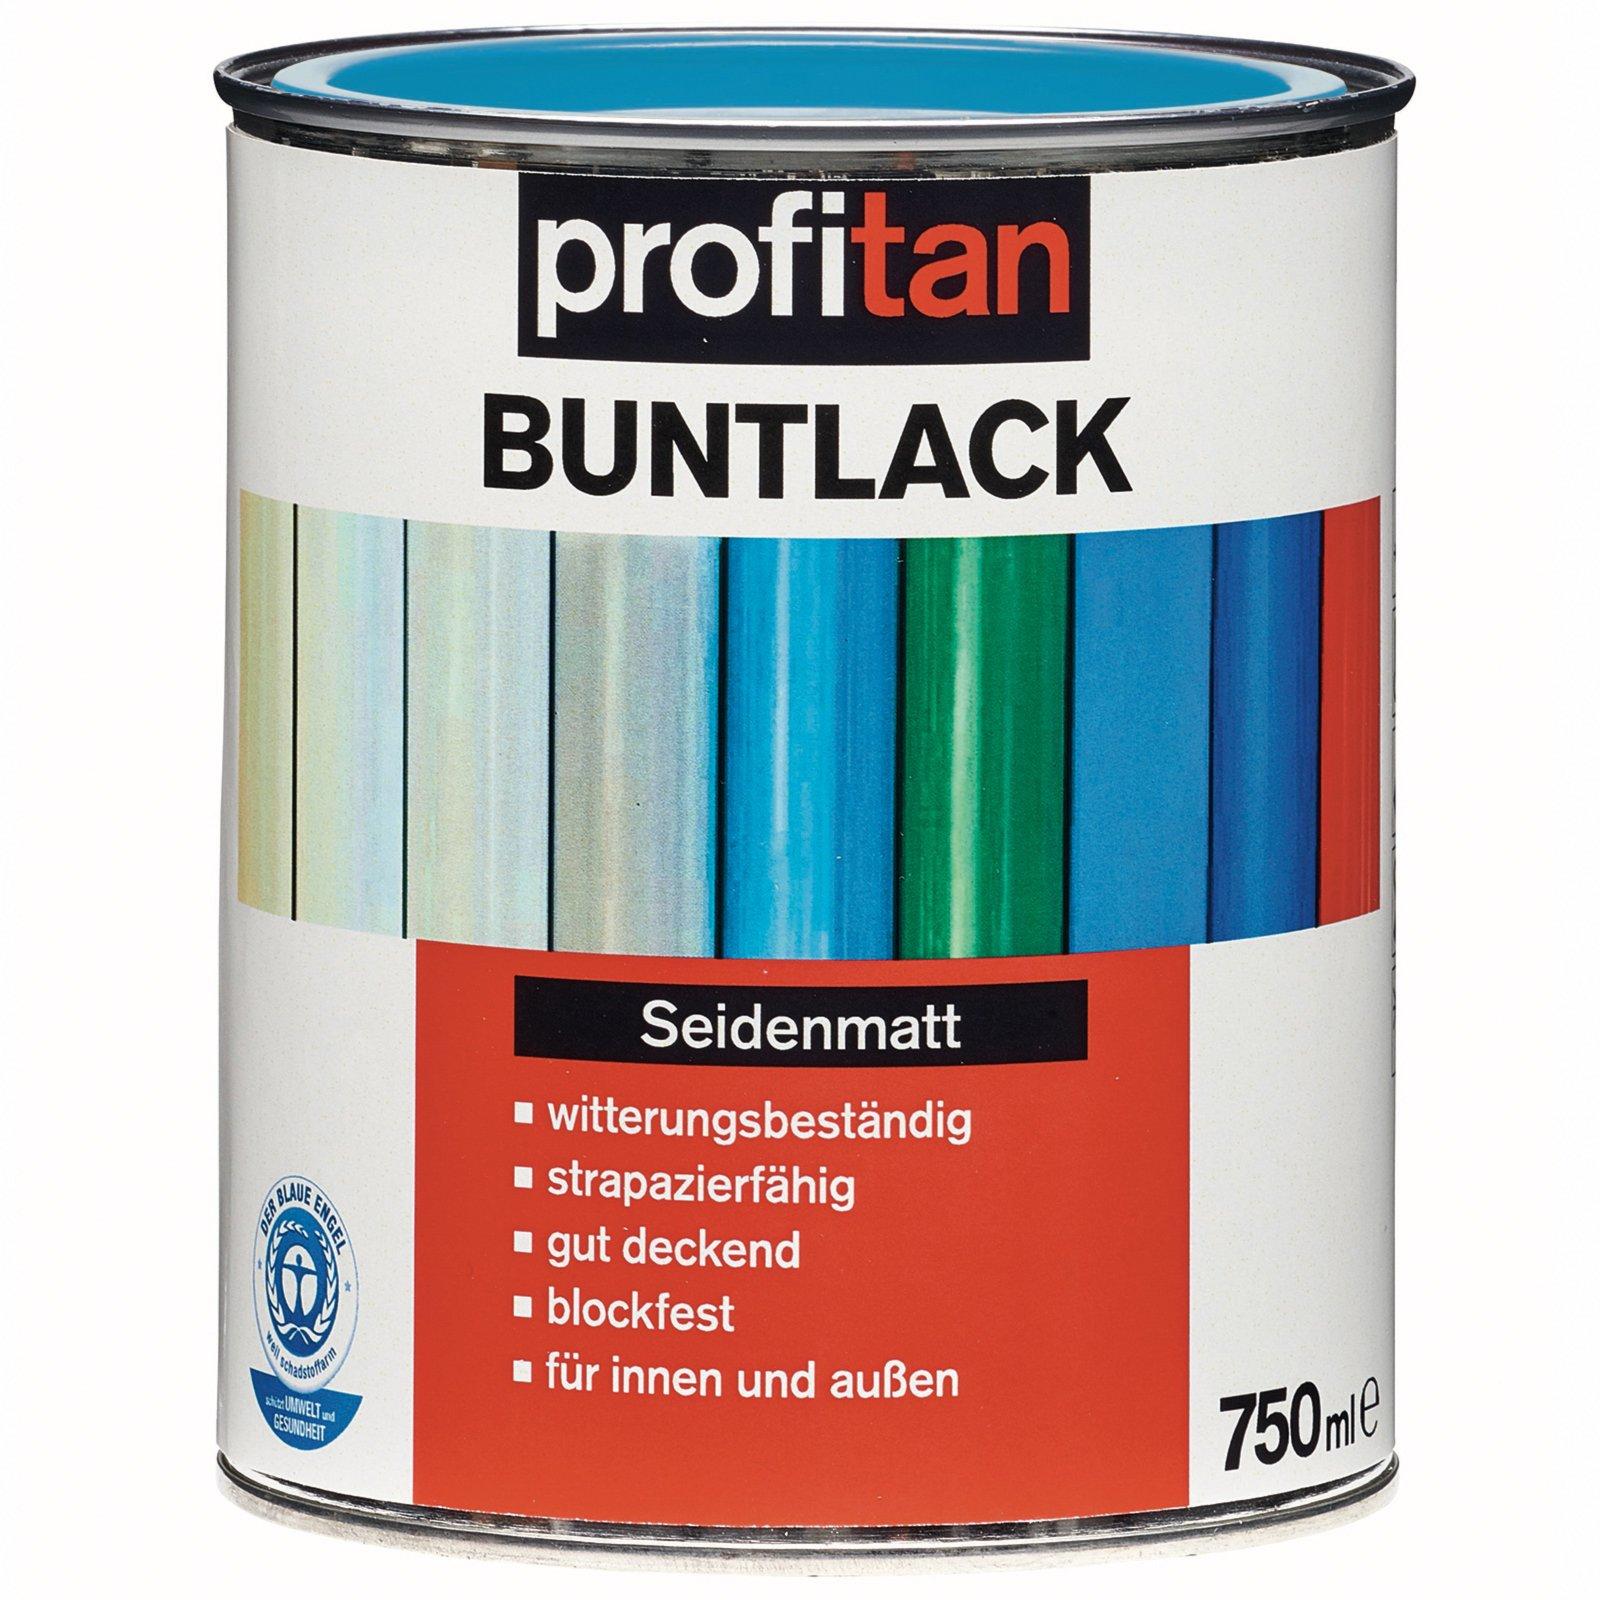 profitan Buntlack - friesenblau seidenmatt - 750 ml